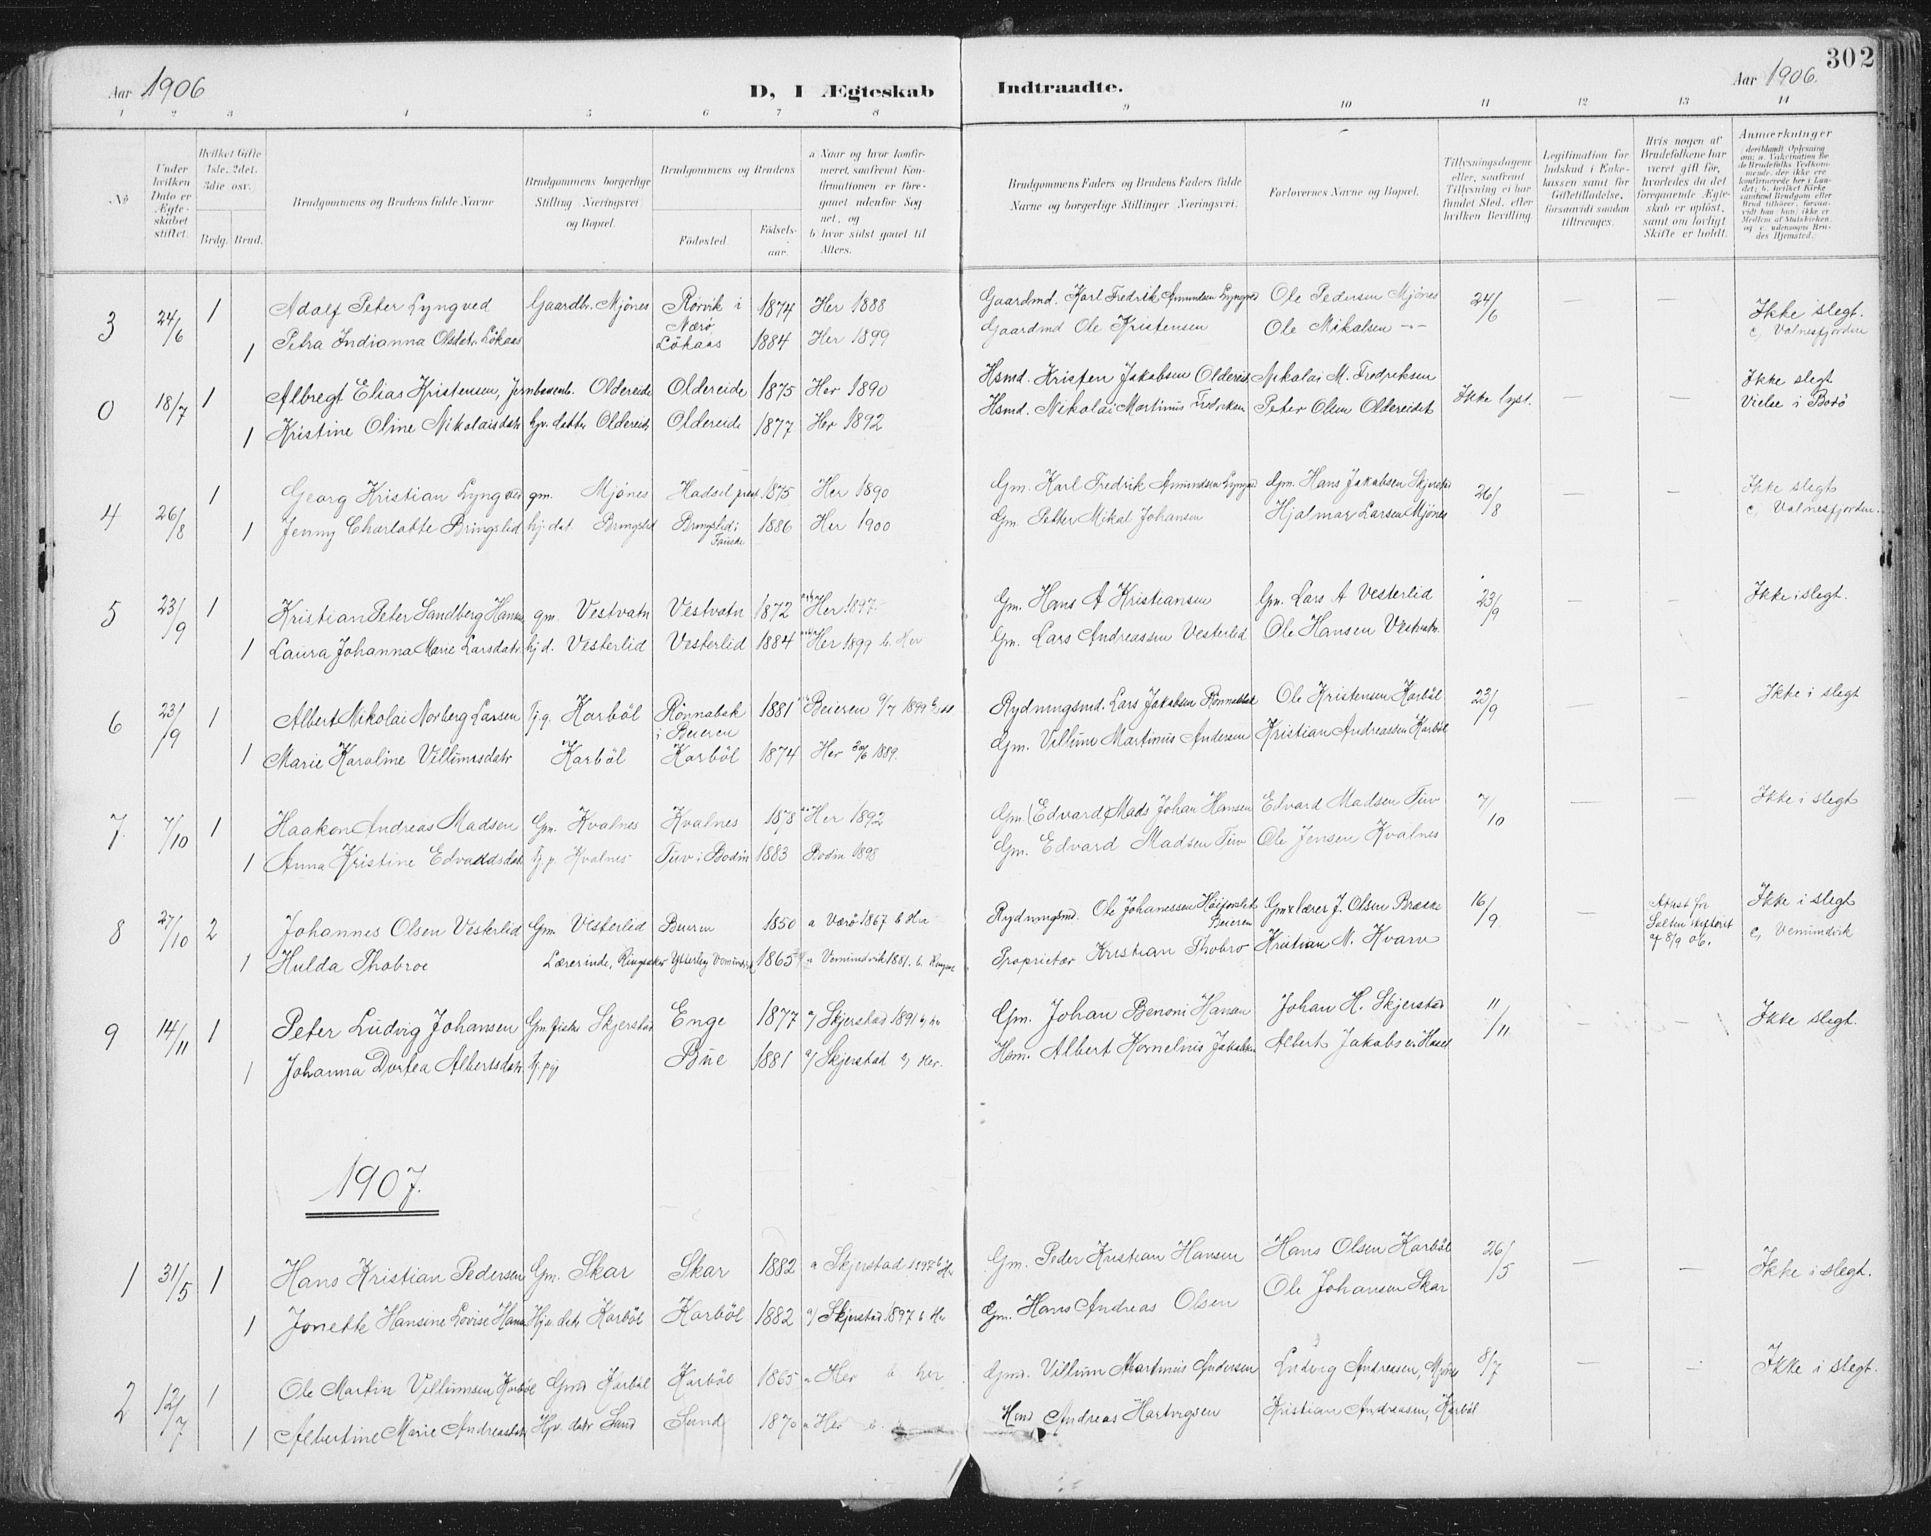 SAT, Ministerialprotokoller, klokkerbøker og fødselsregistre - Nordland, 852/L0741: Ministerialbok nr. 852A11, 1894-1917, s. 302